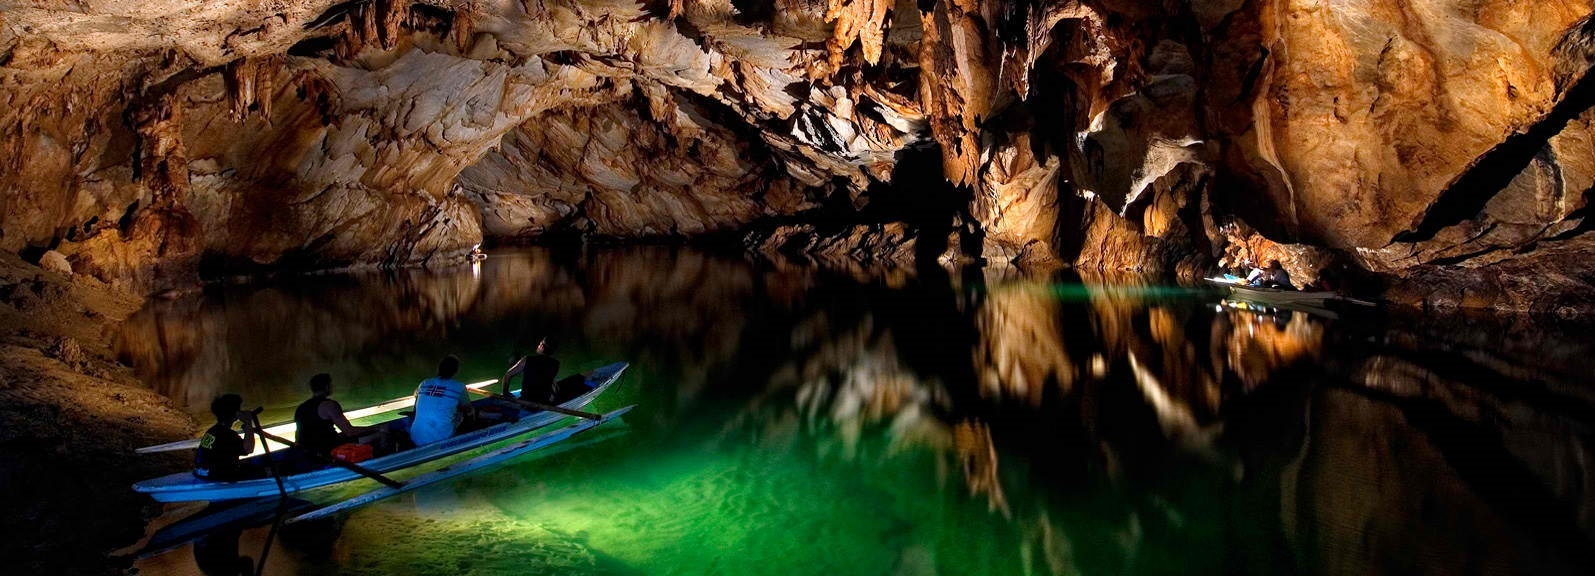 [Image: Explore-Palawan-Philippines-Puerto-Princ...r-Park.jpg]